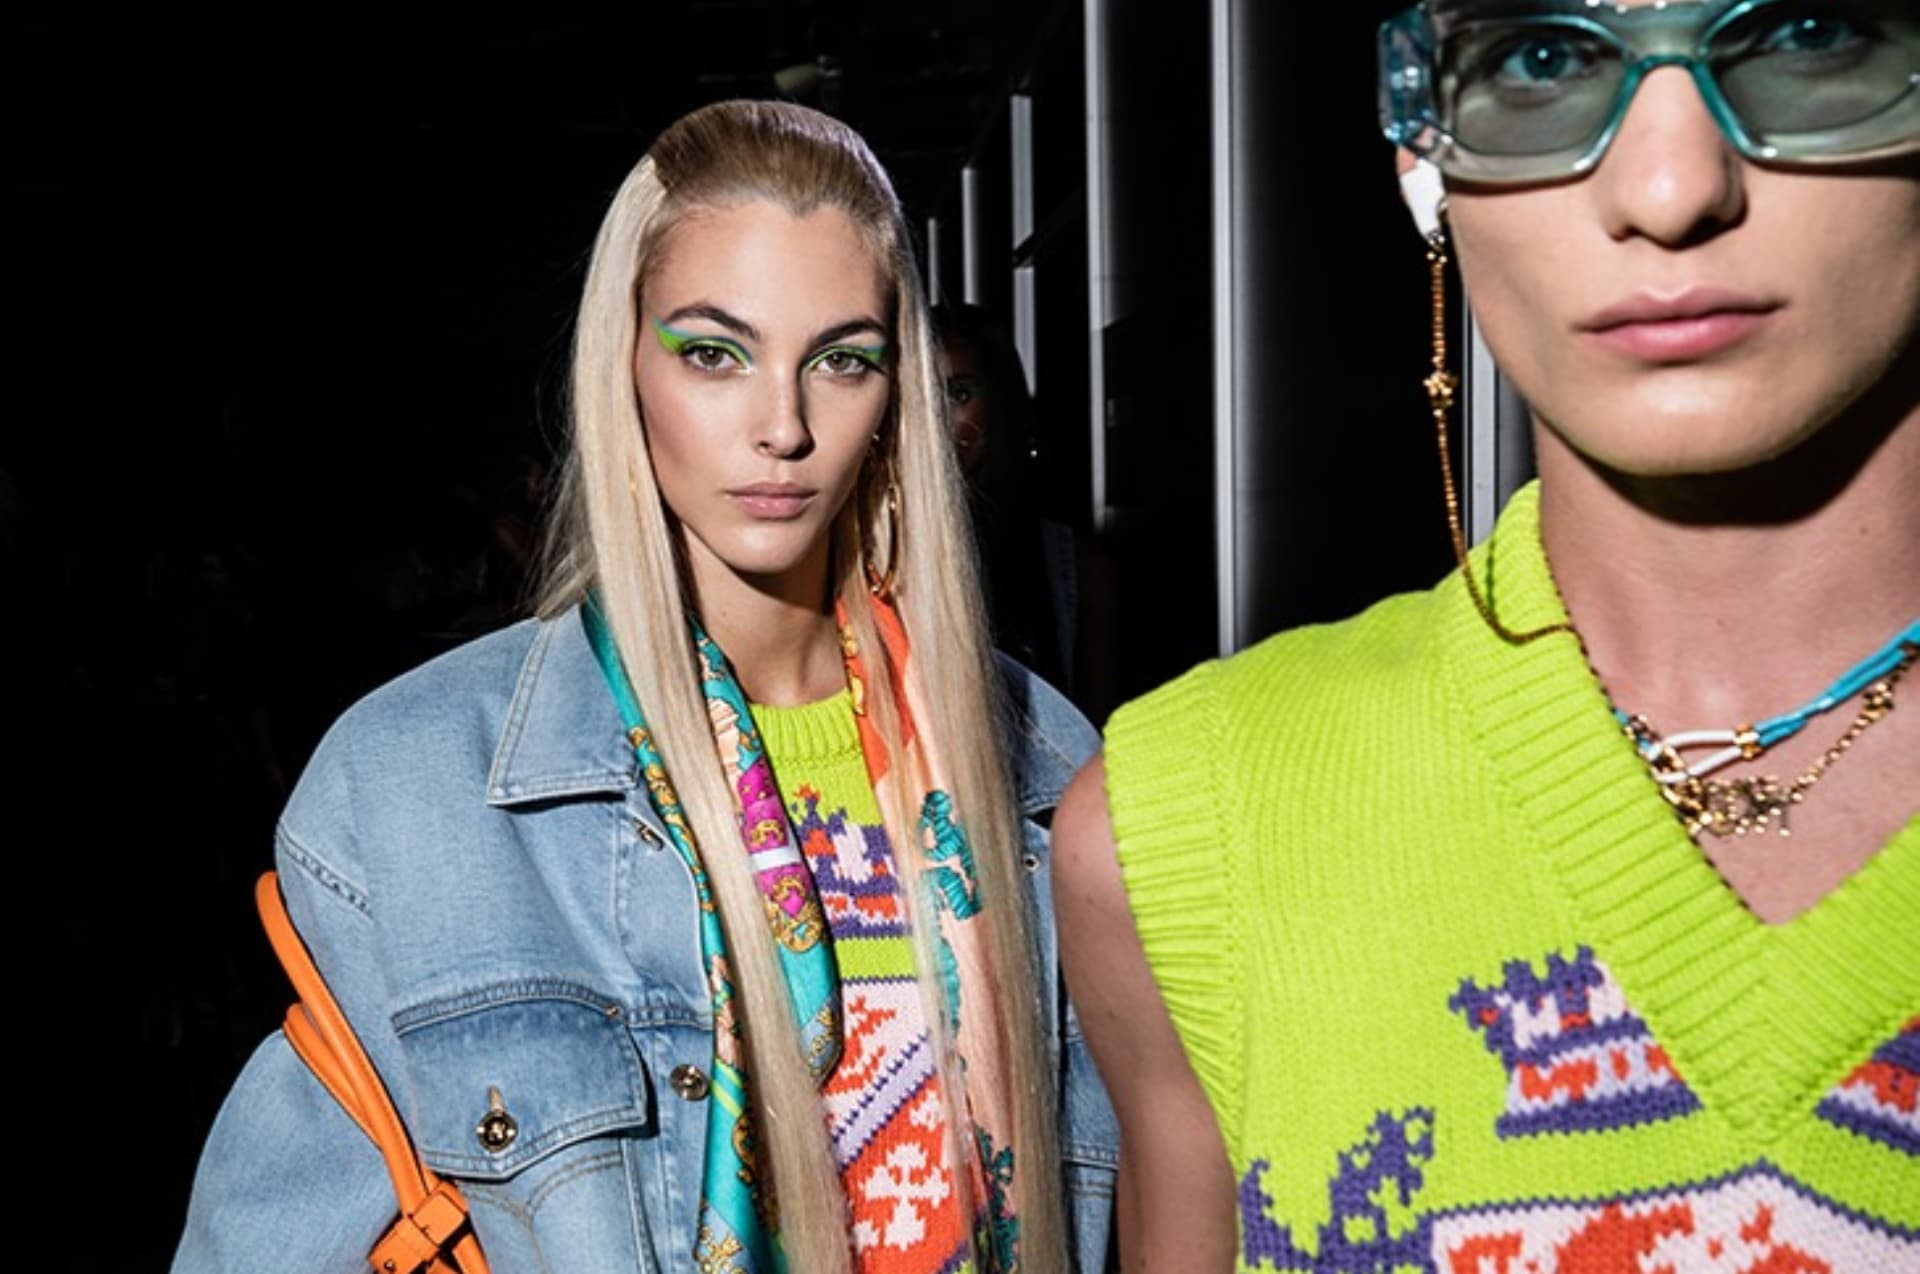 Moda iltaliana en fashion week